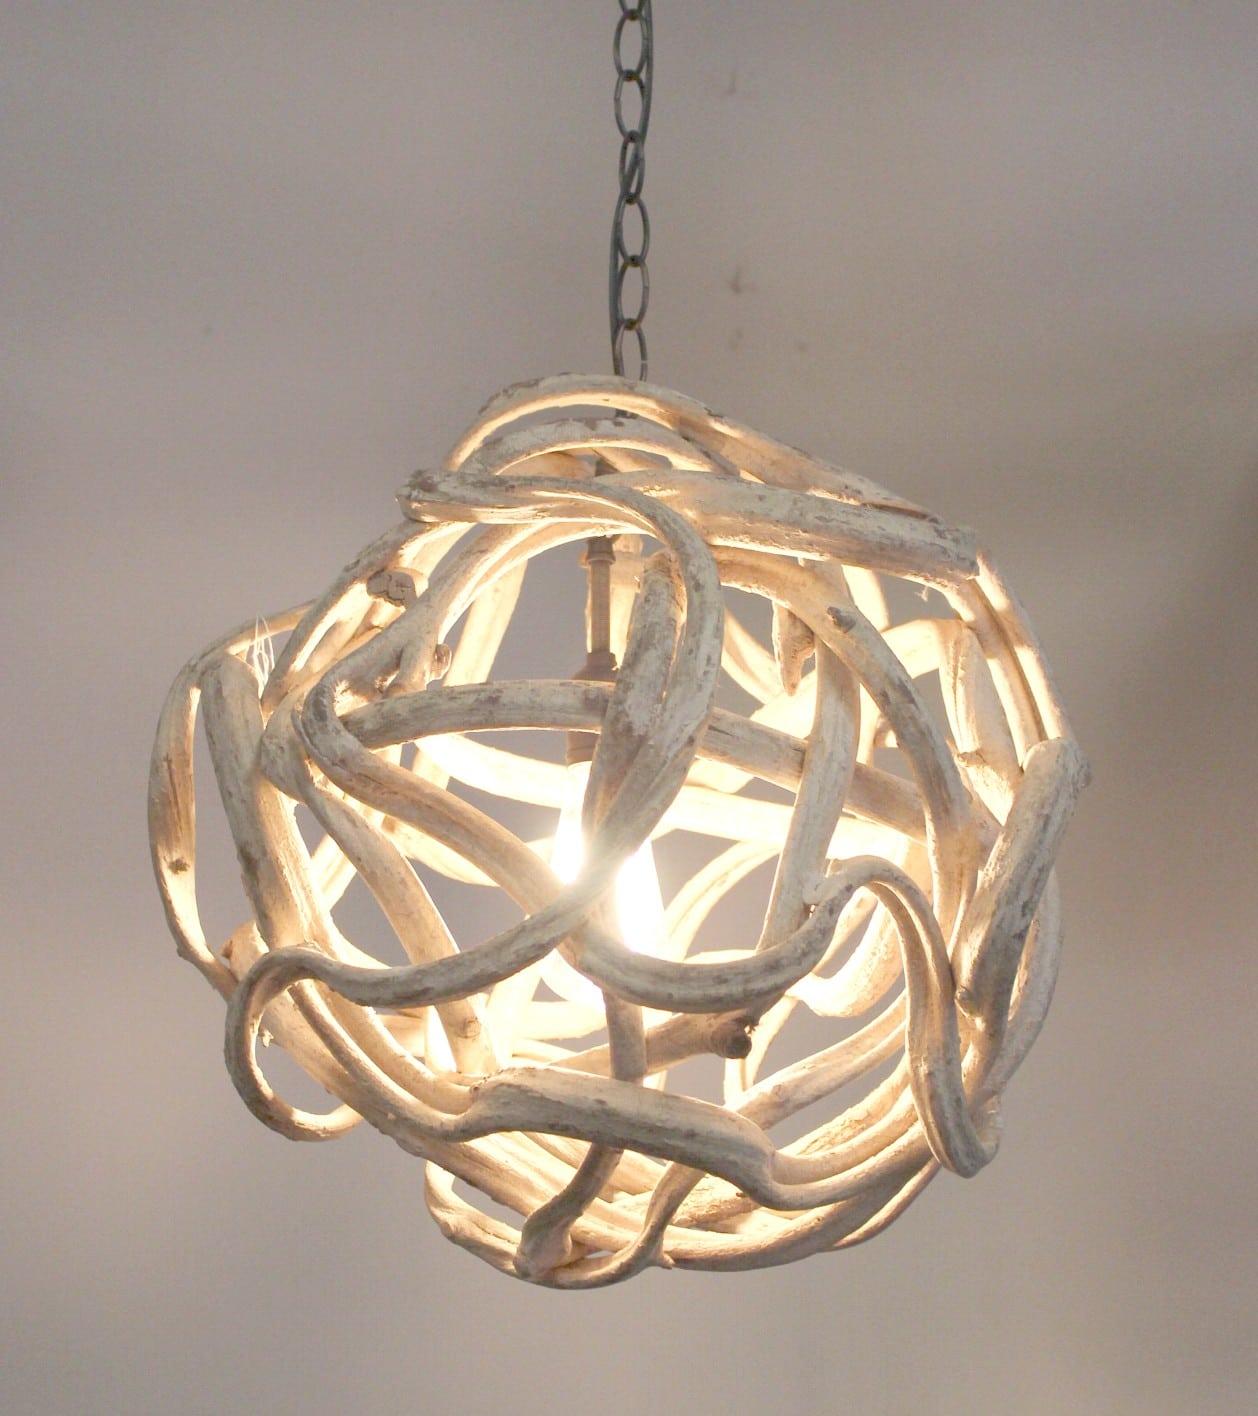 vine chandelier mansion lighting forging hopper custom organic design iron sculpture greystone img daniel